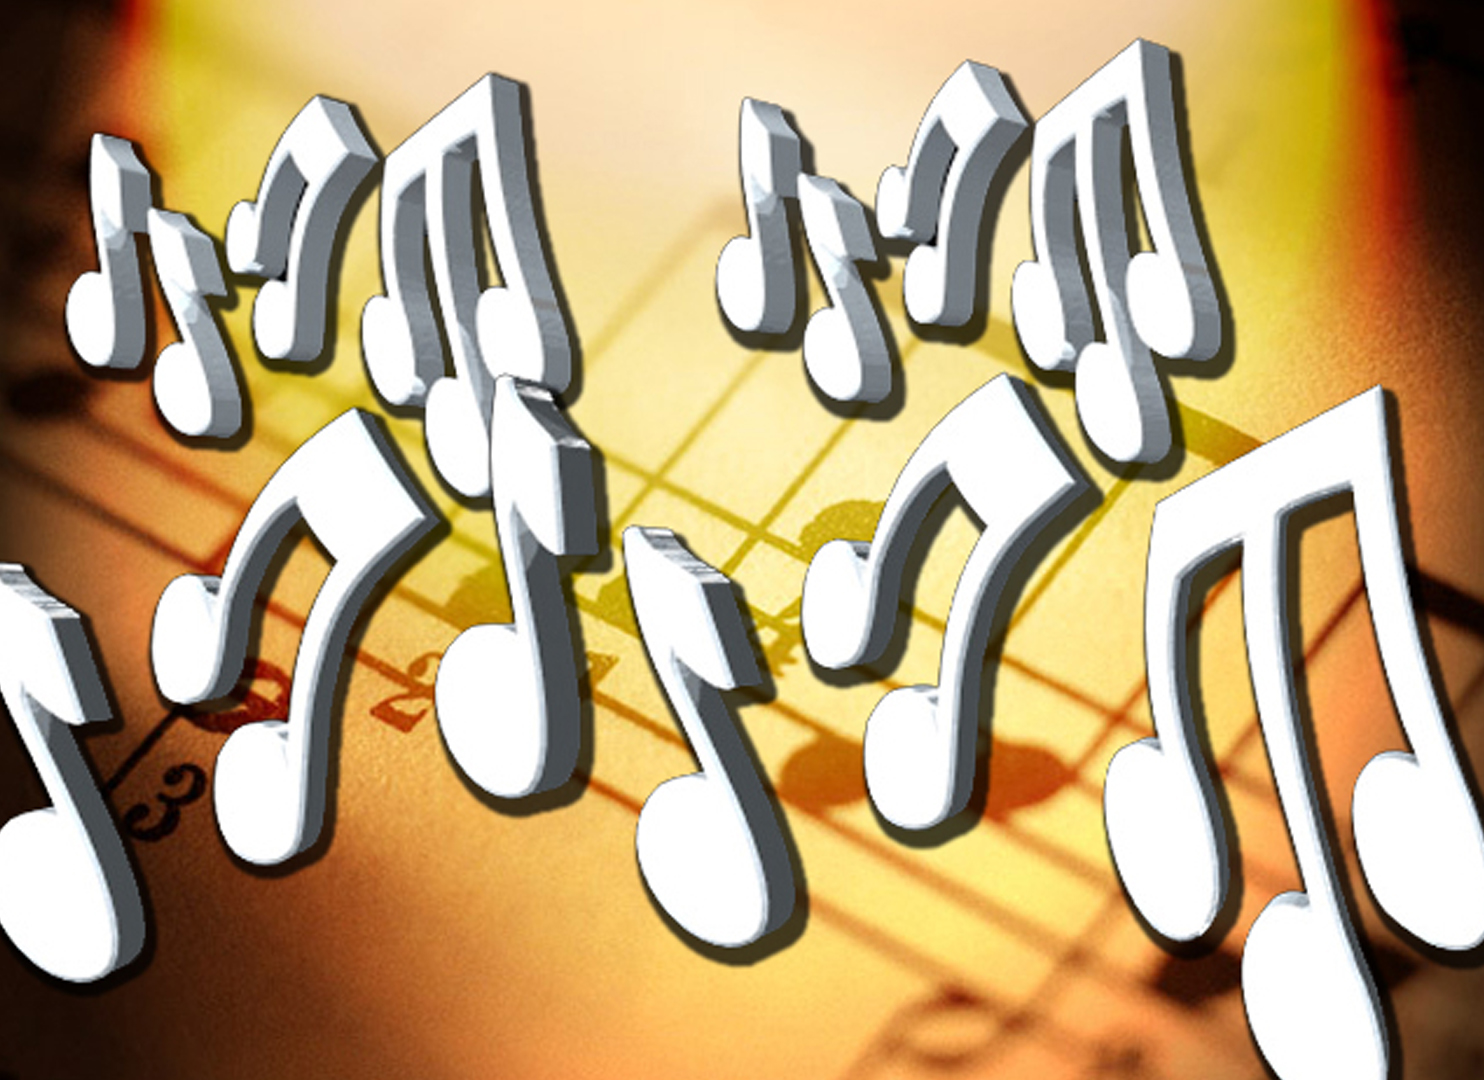 music notes_1498601490788.jpg